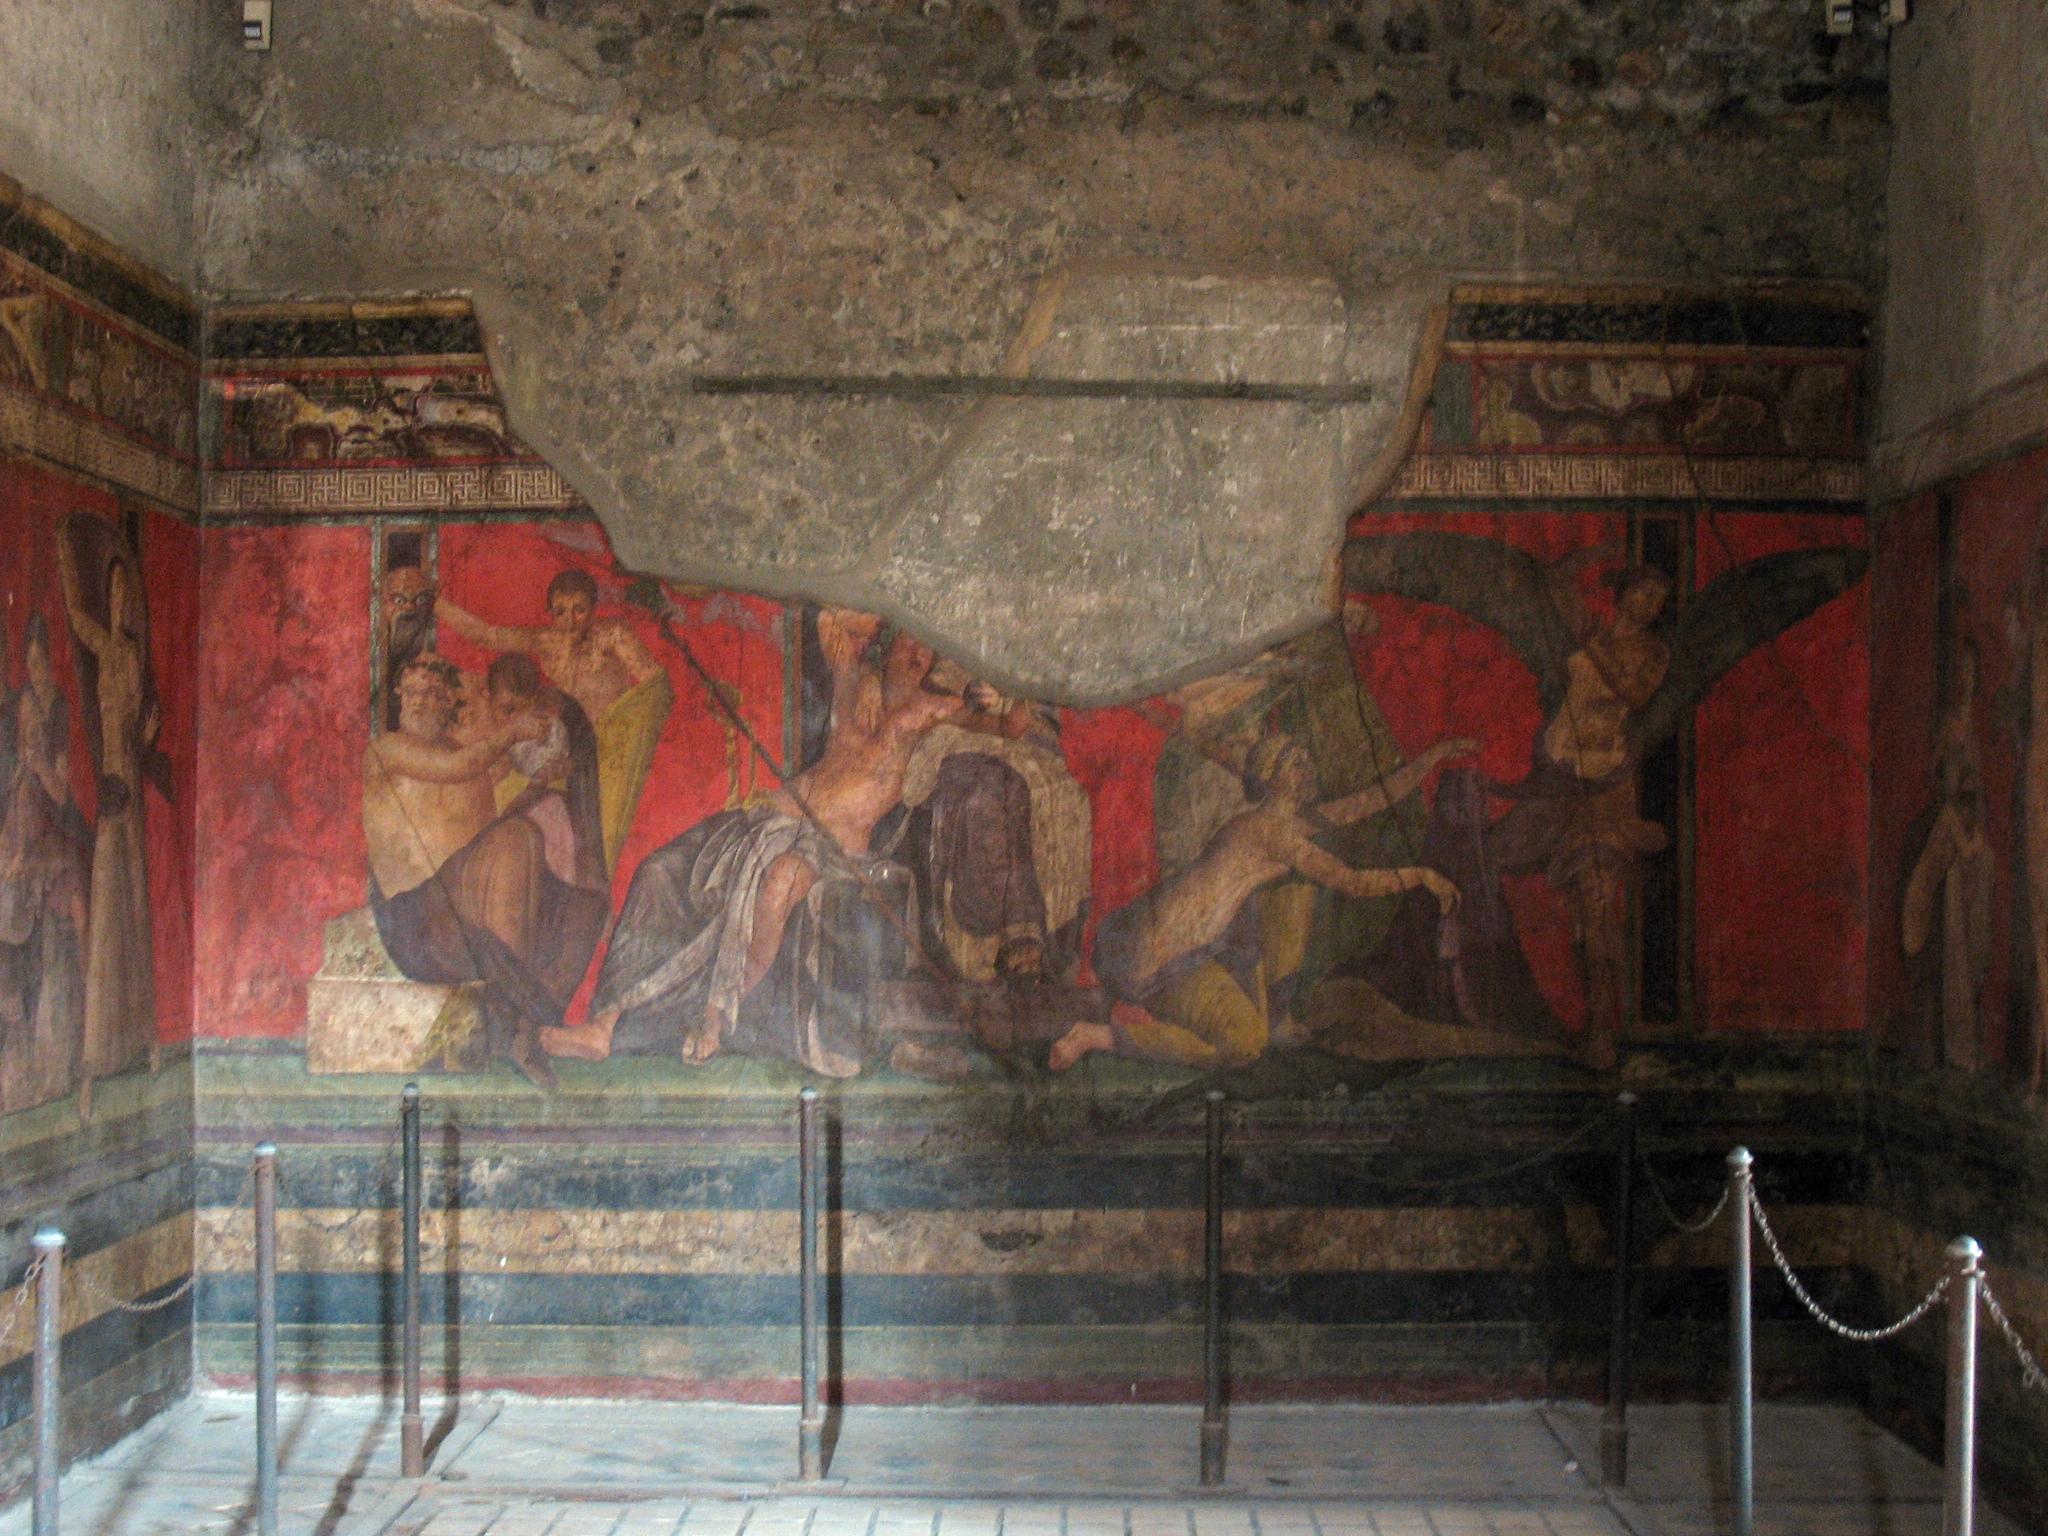 Pompeii & Herculaneum: Rediscovering Roman Art & Culture | April 27 ...